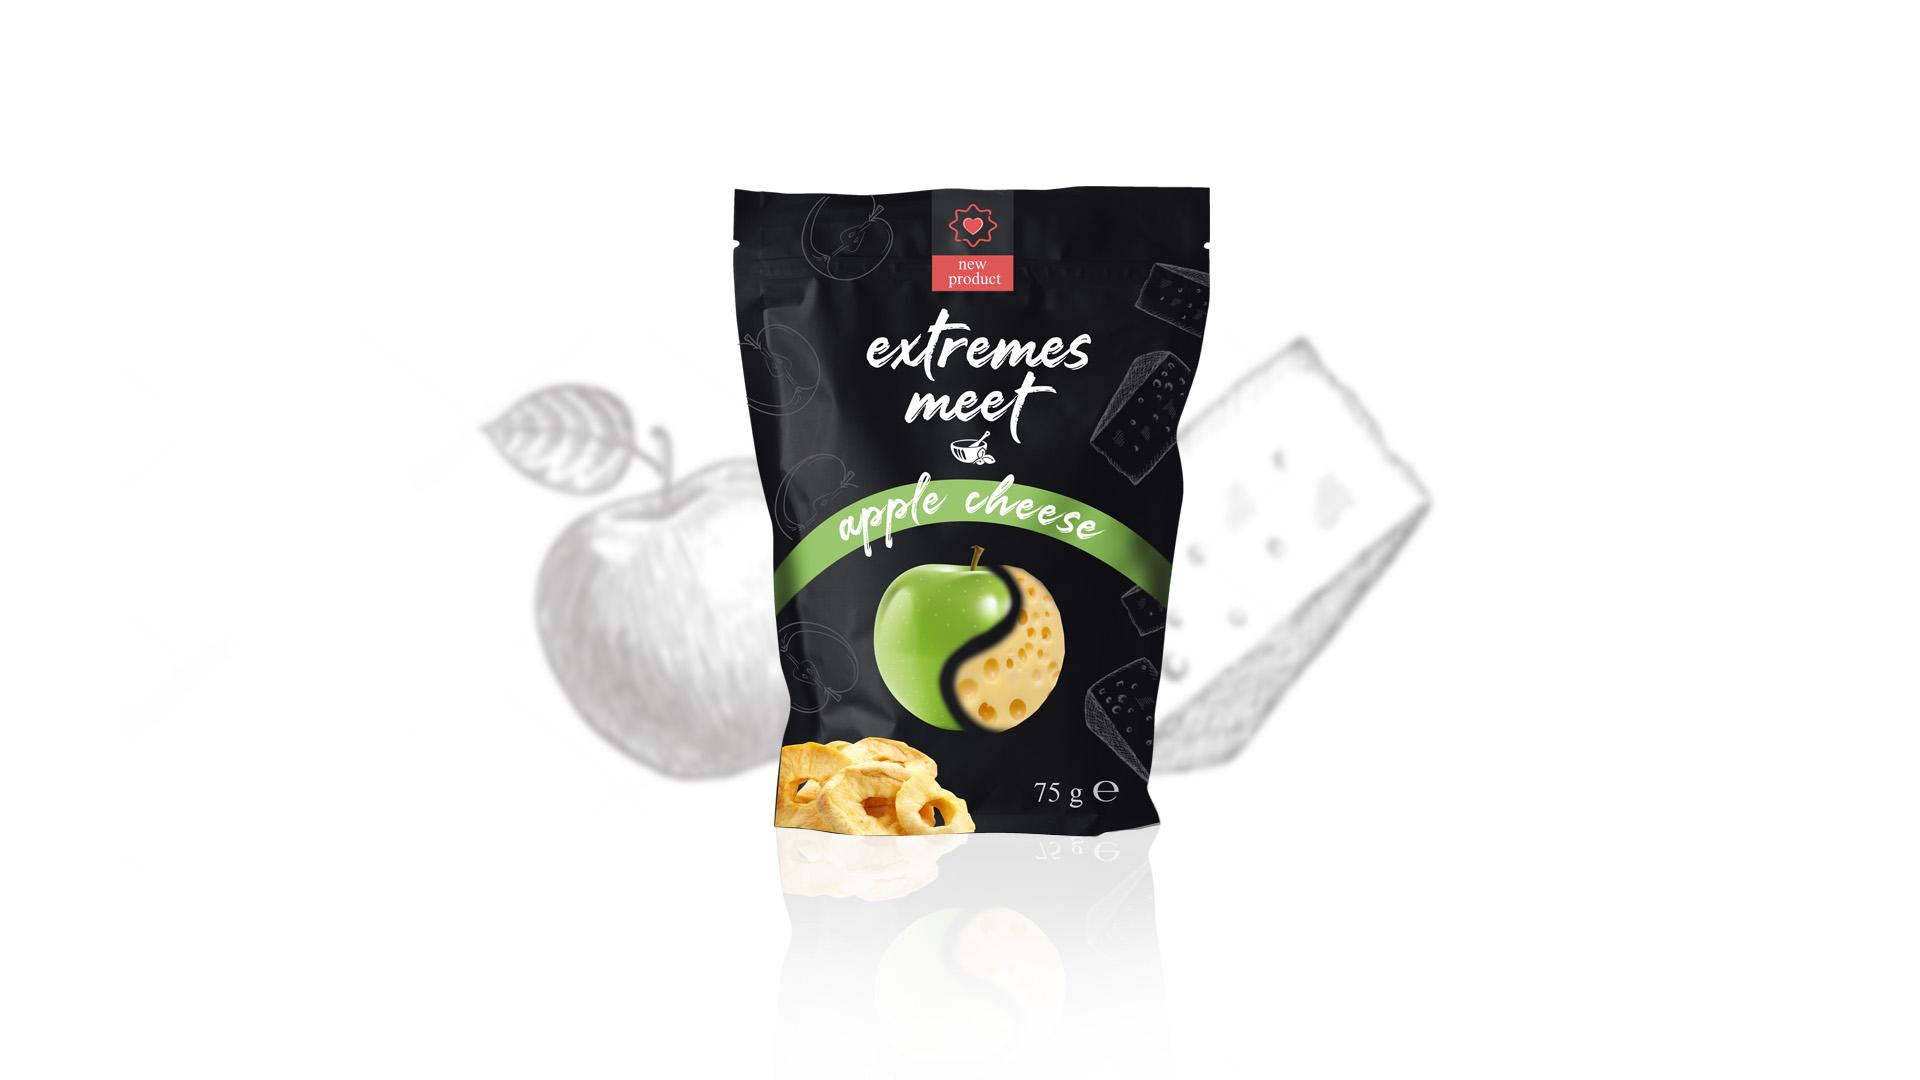 snack package design stas qlare shvechkov